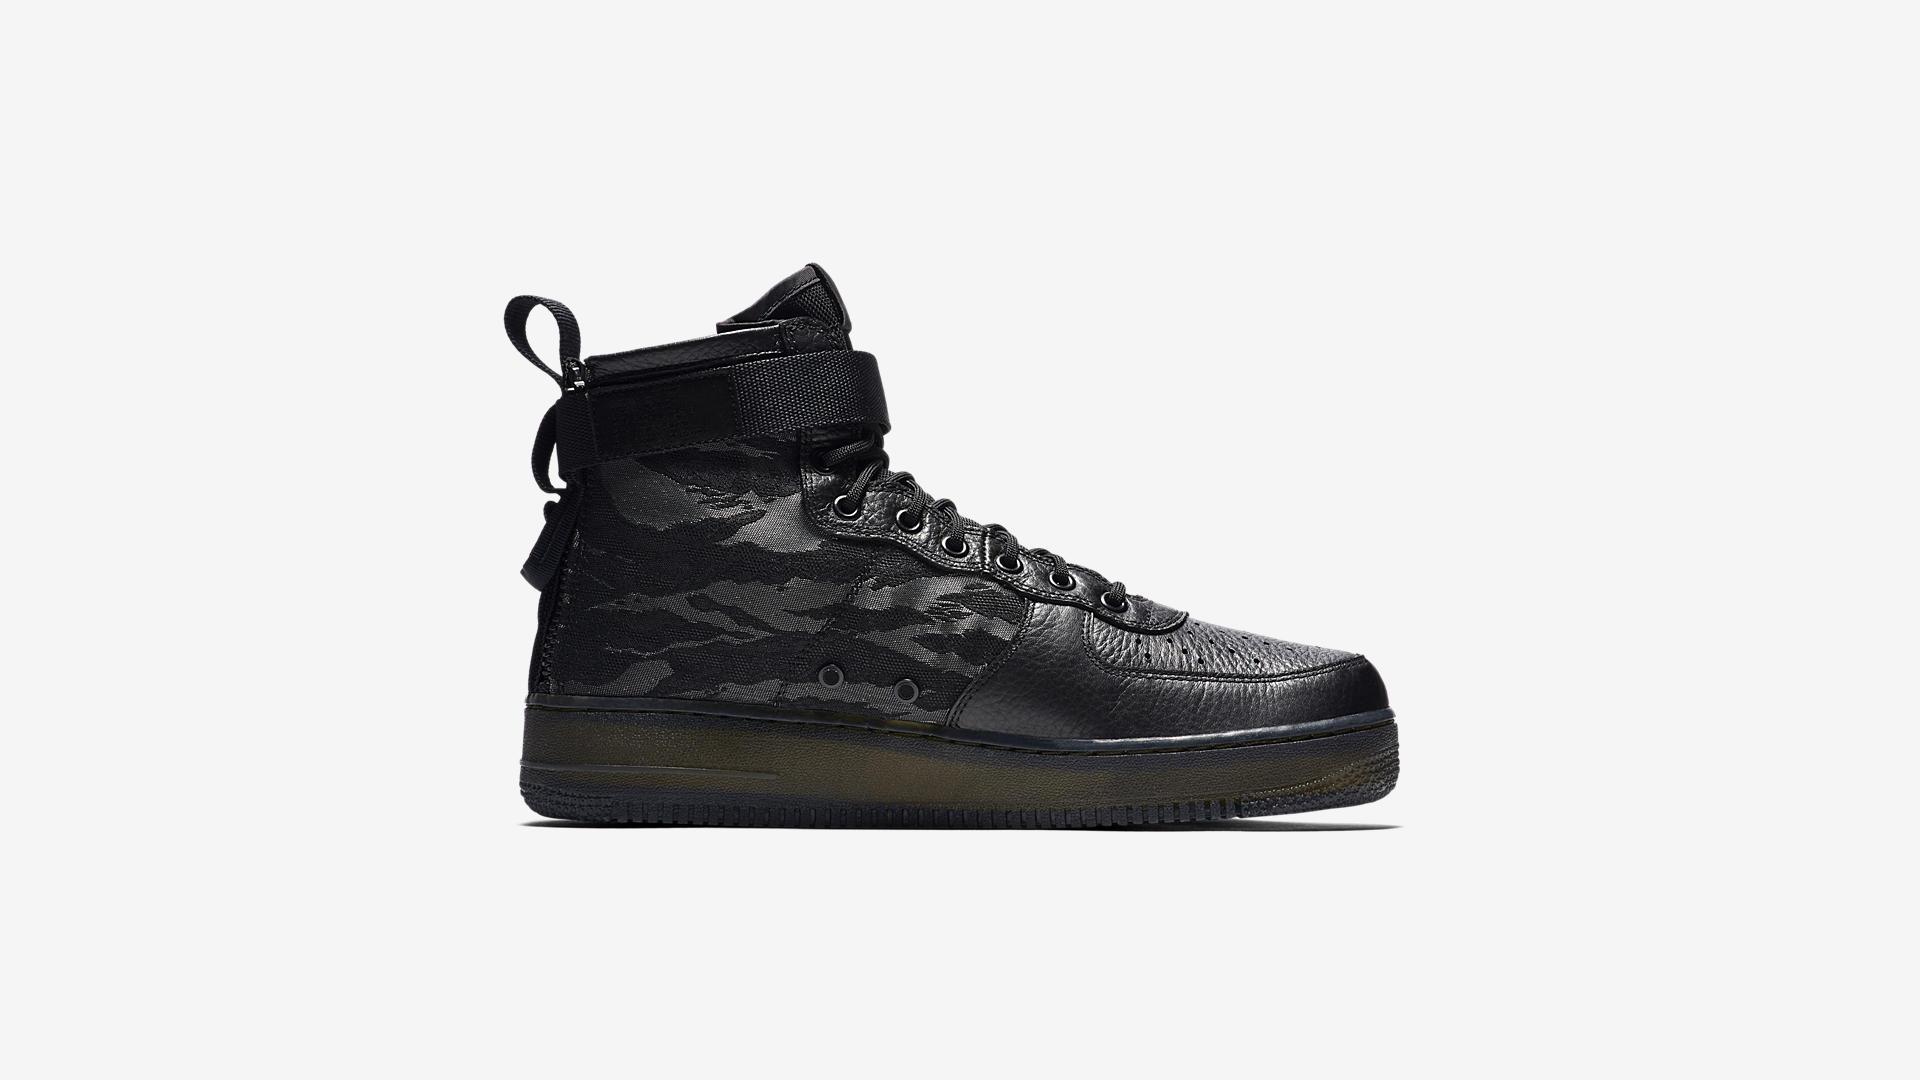 Nike SF Air Force 1 Mid Black Cargo Khaki AA7345 001 2